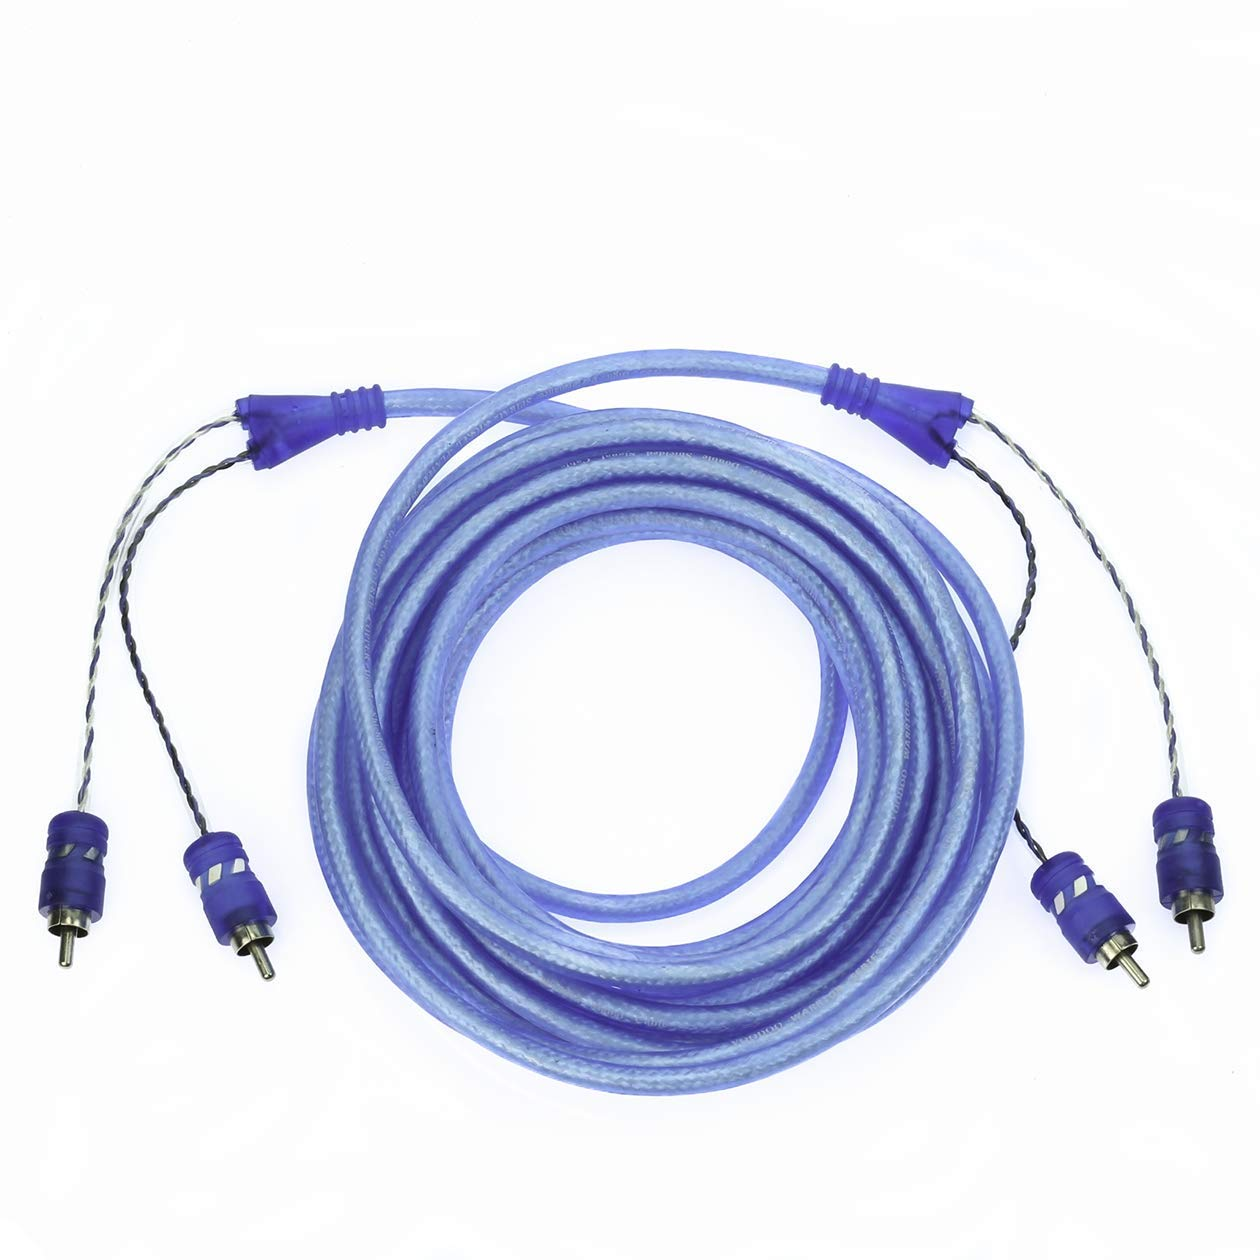 VooDoo 20 ft 6 Meter RCA Interconnect Cable Blue OFC Copper 12Volt Distributors